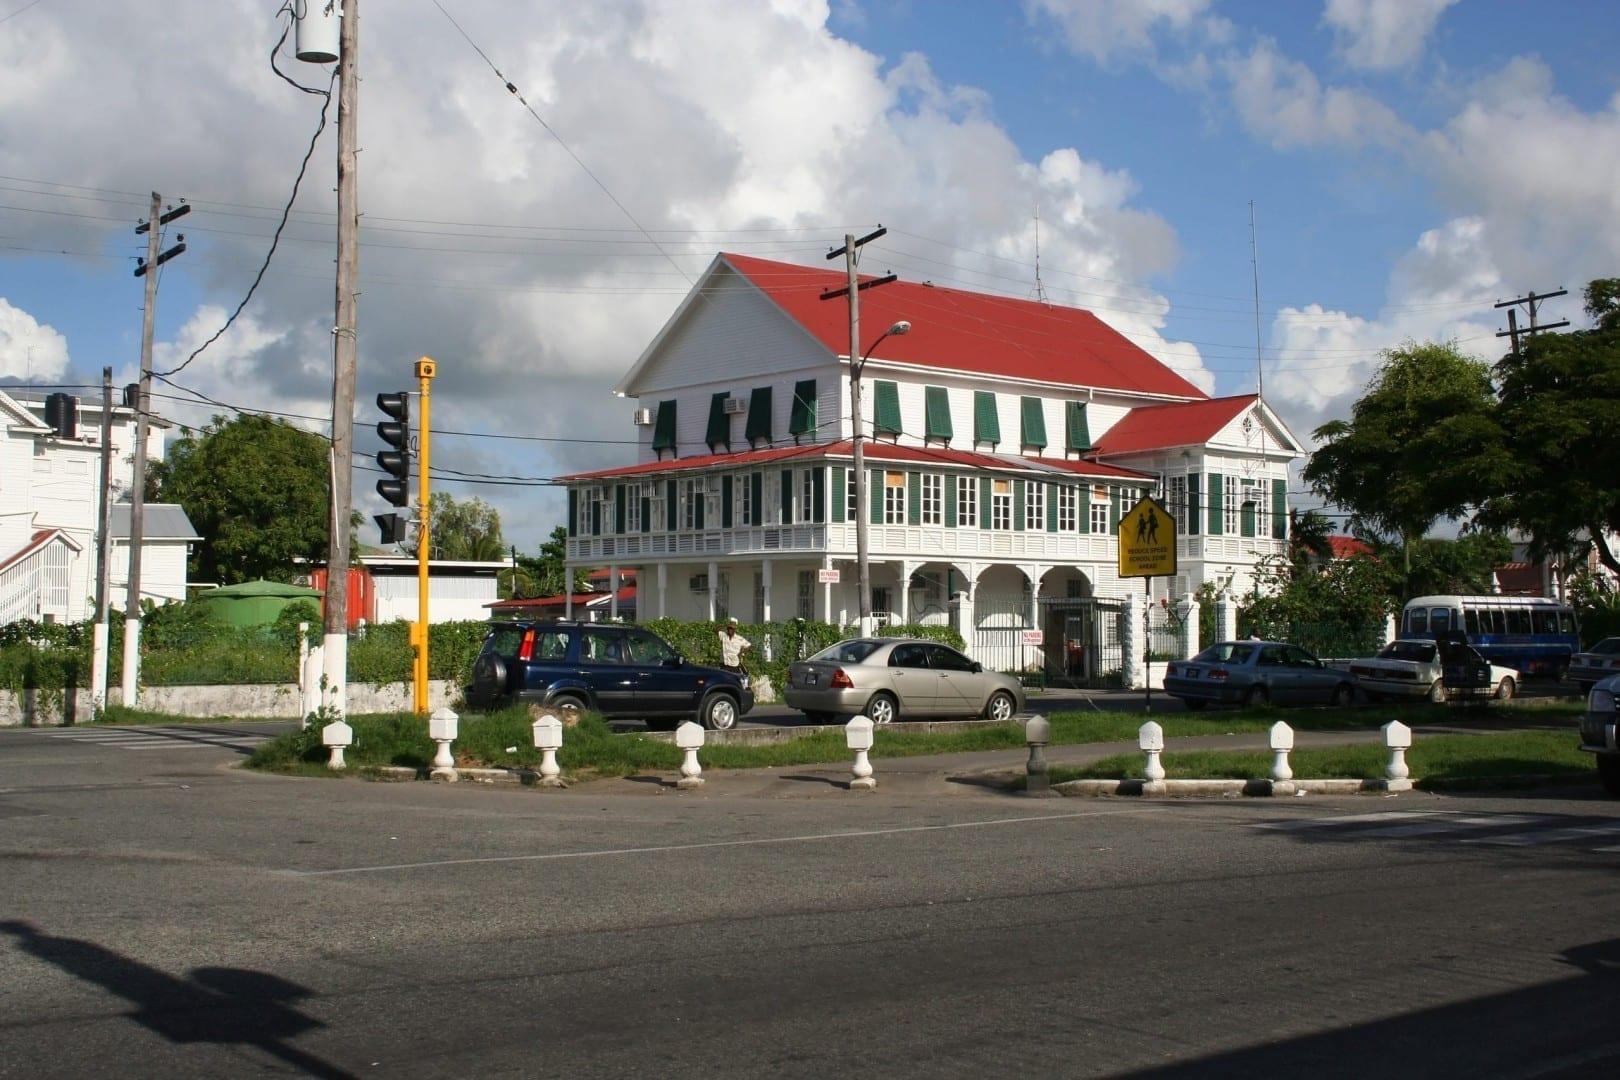 Vista de la calle en Georgetown Guyana